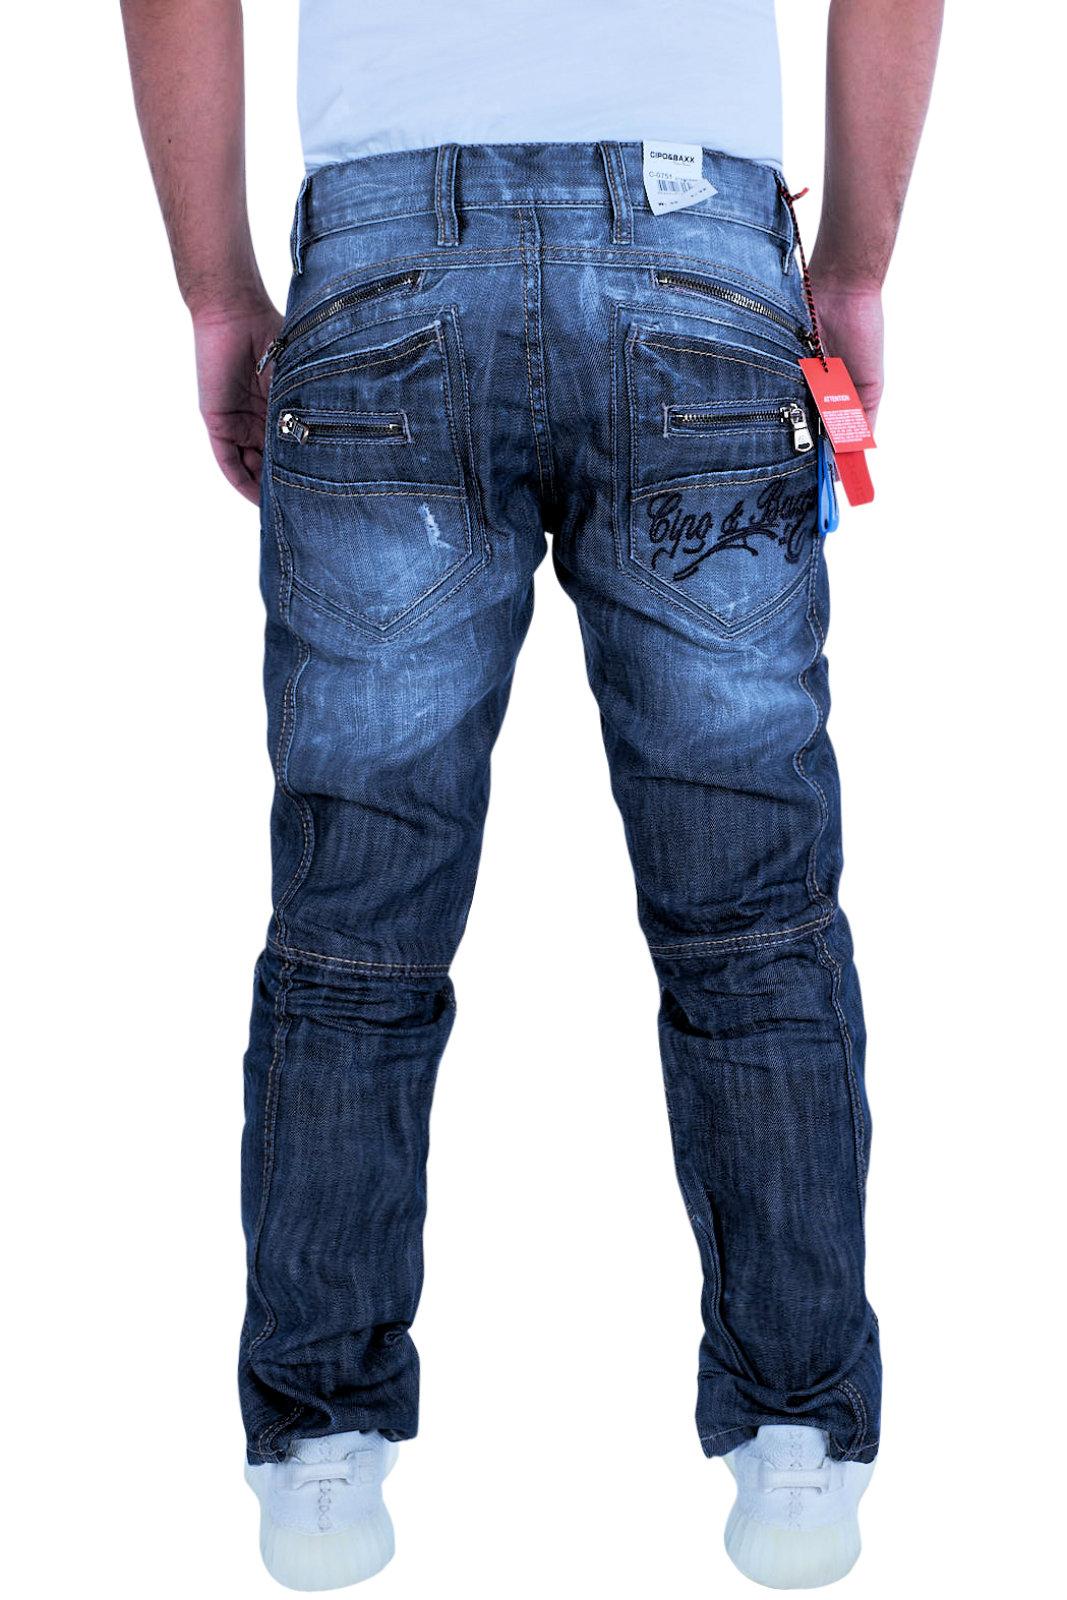 cipo baxx herren jeans clubwear denim hose c 0751 stone. Black Bedroom Furniture Sets. Home Design Ideas